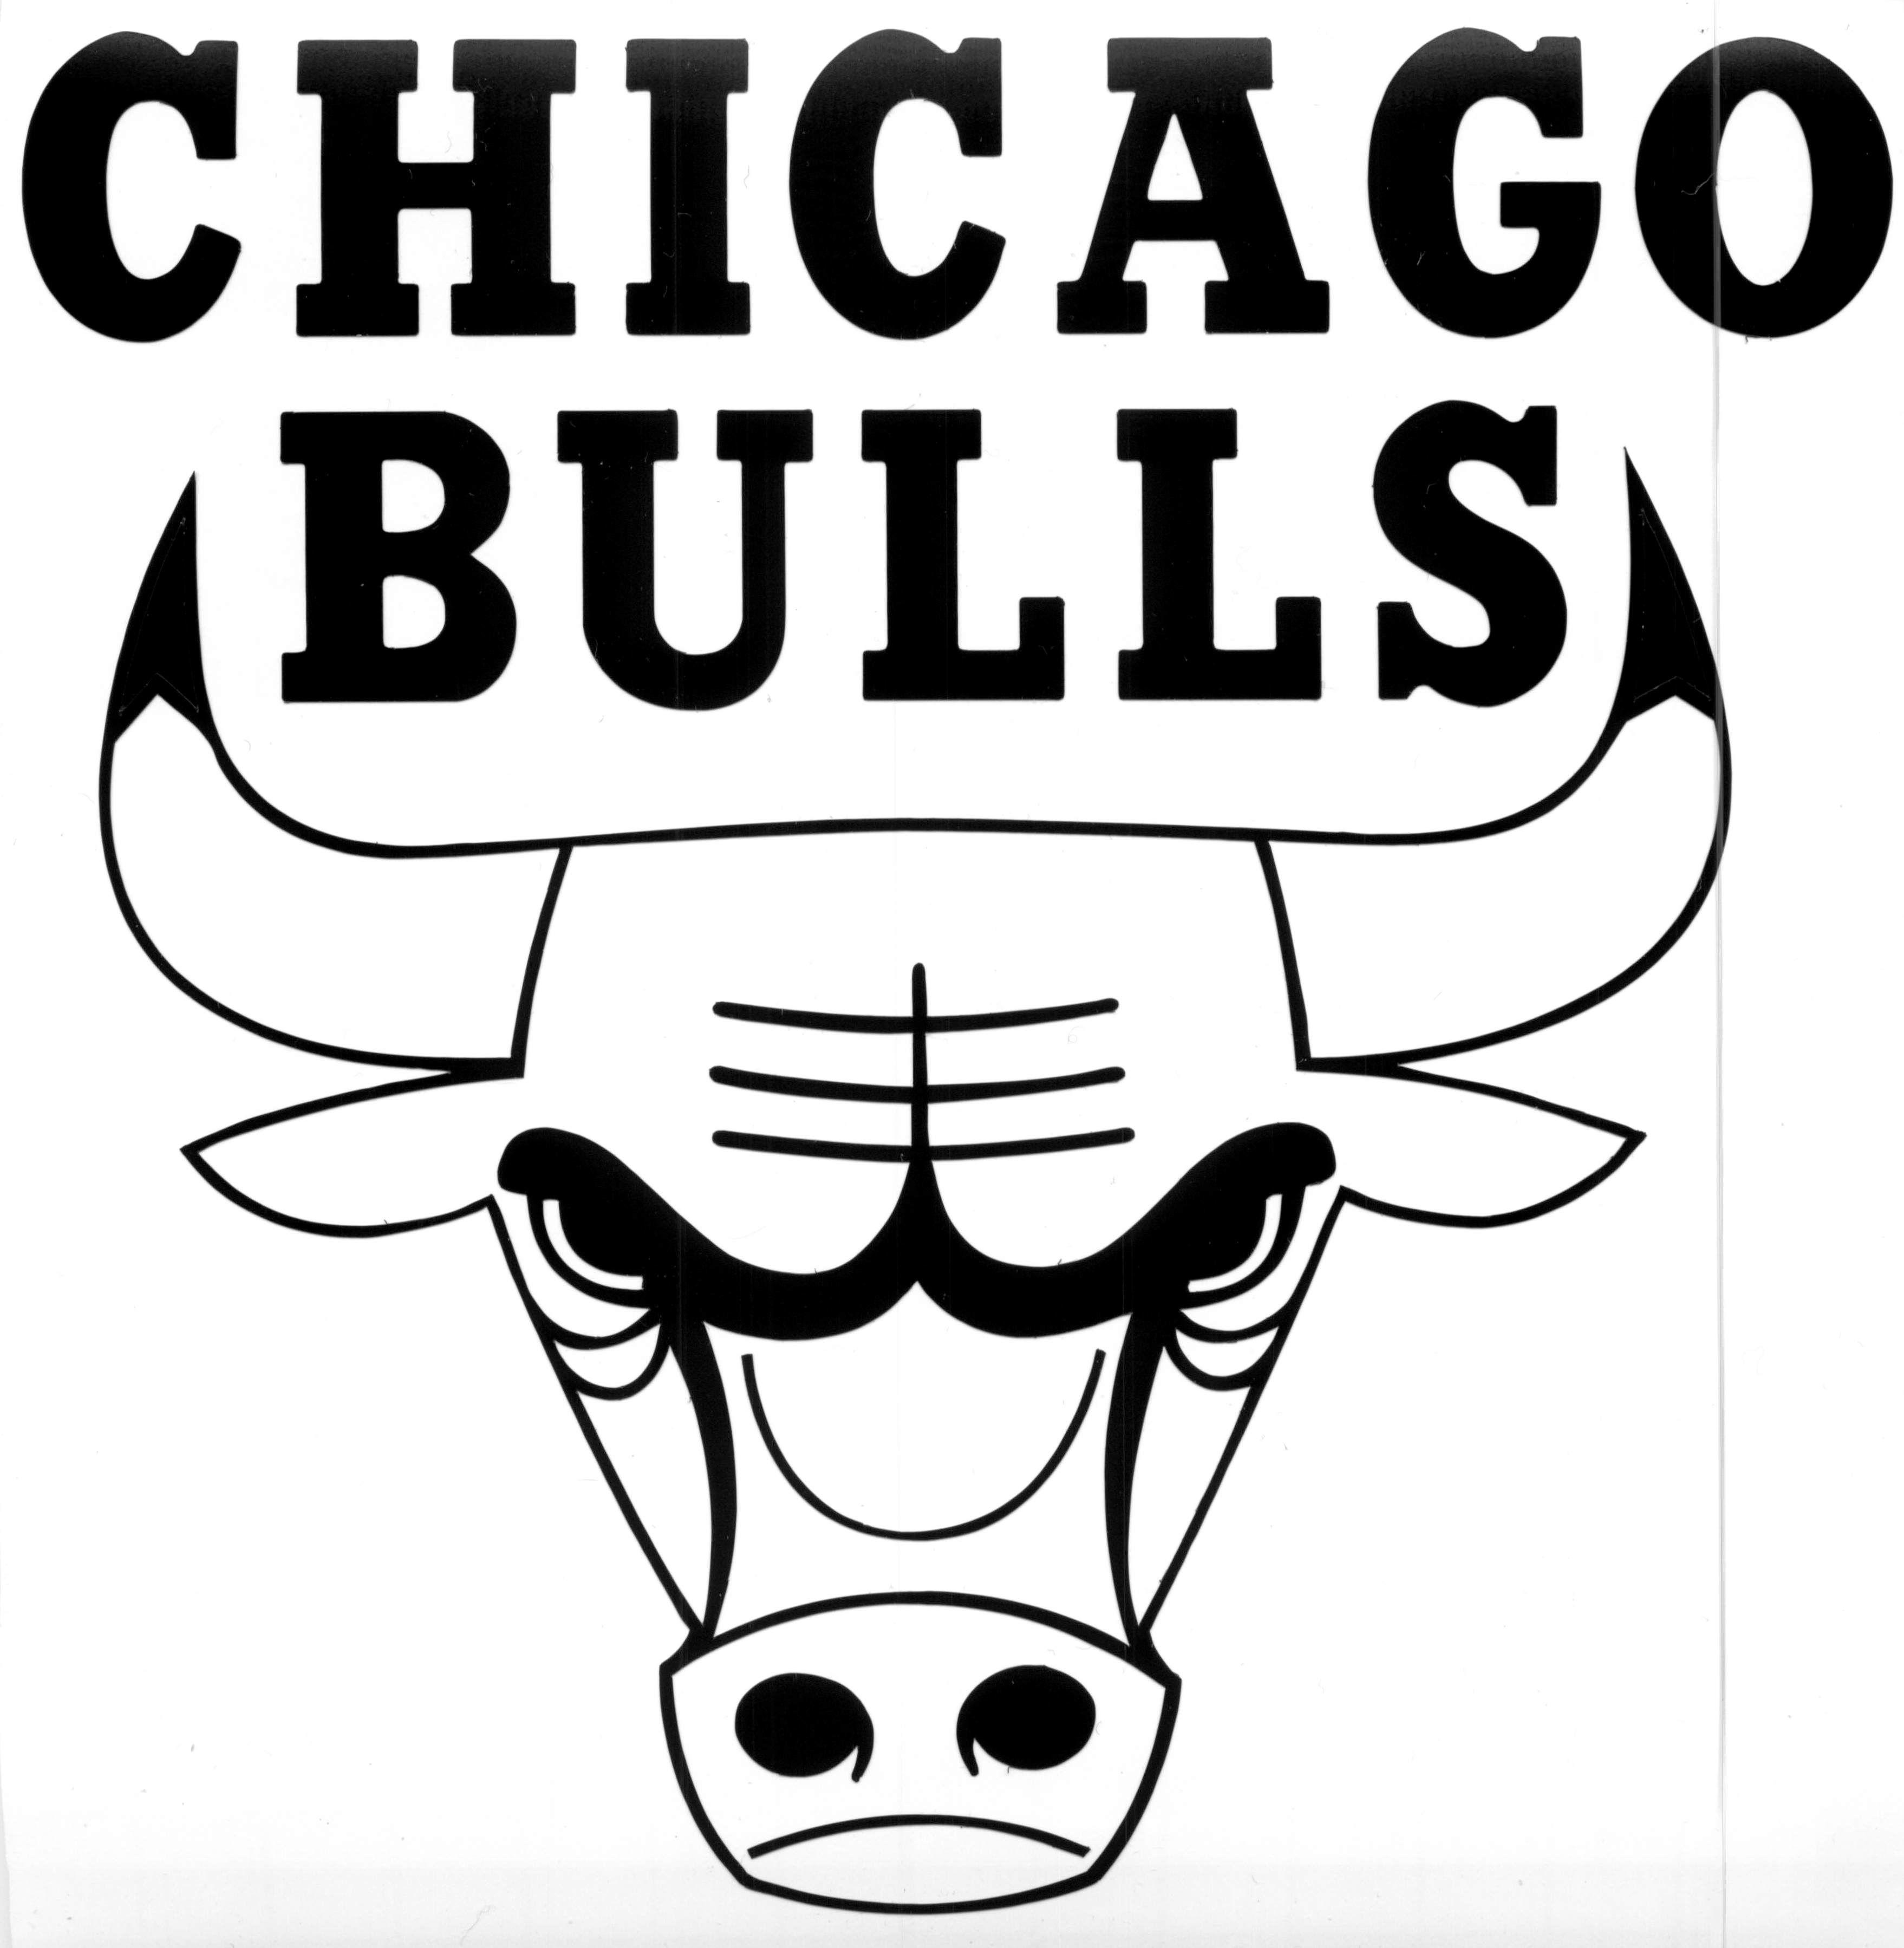 Chicago bulls clipart 9 » Clipart Station.